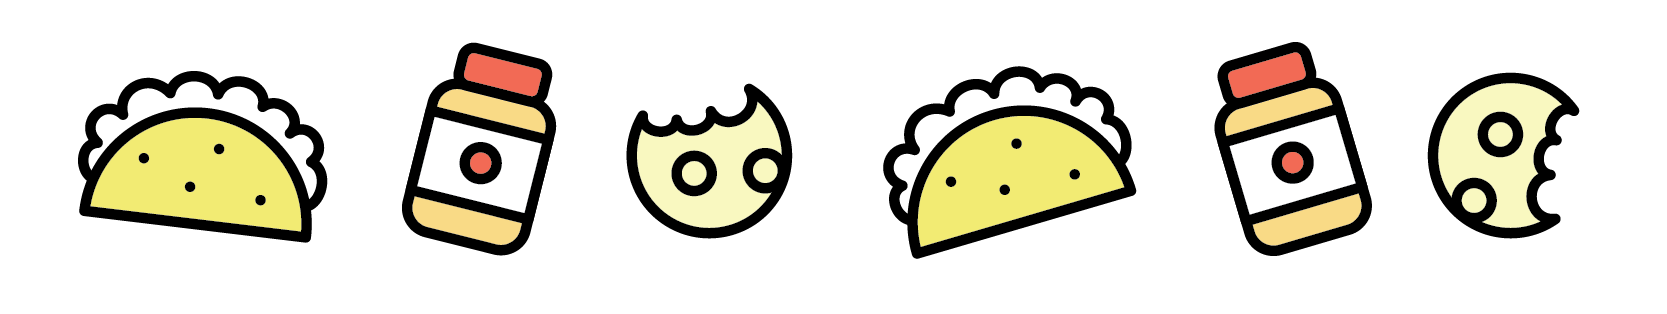 foodie_illustration-02.png